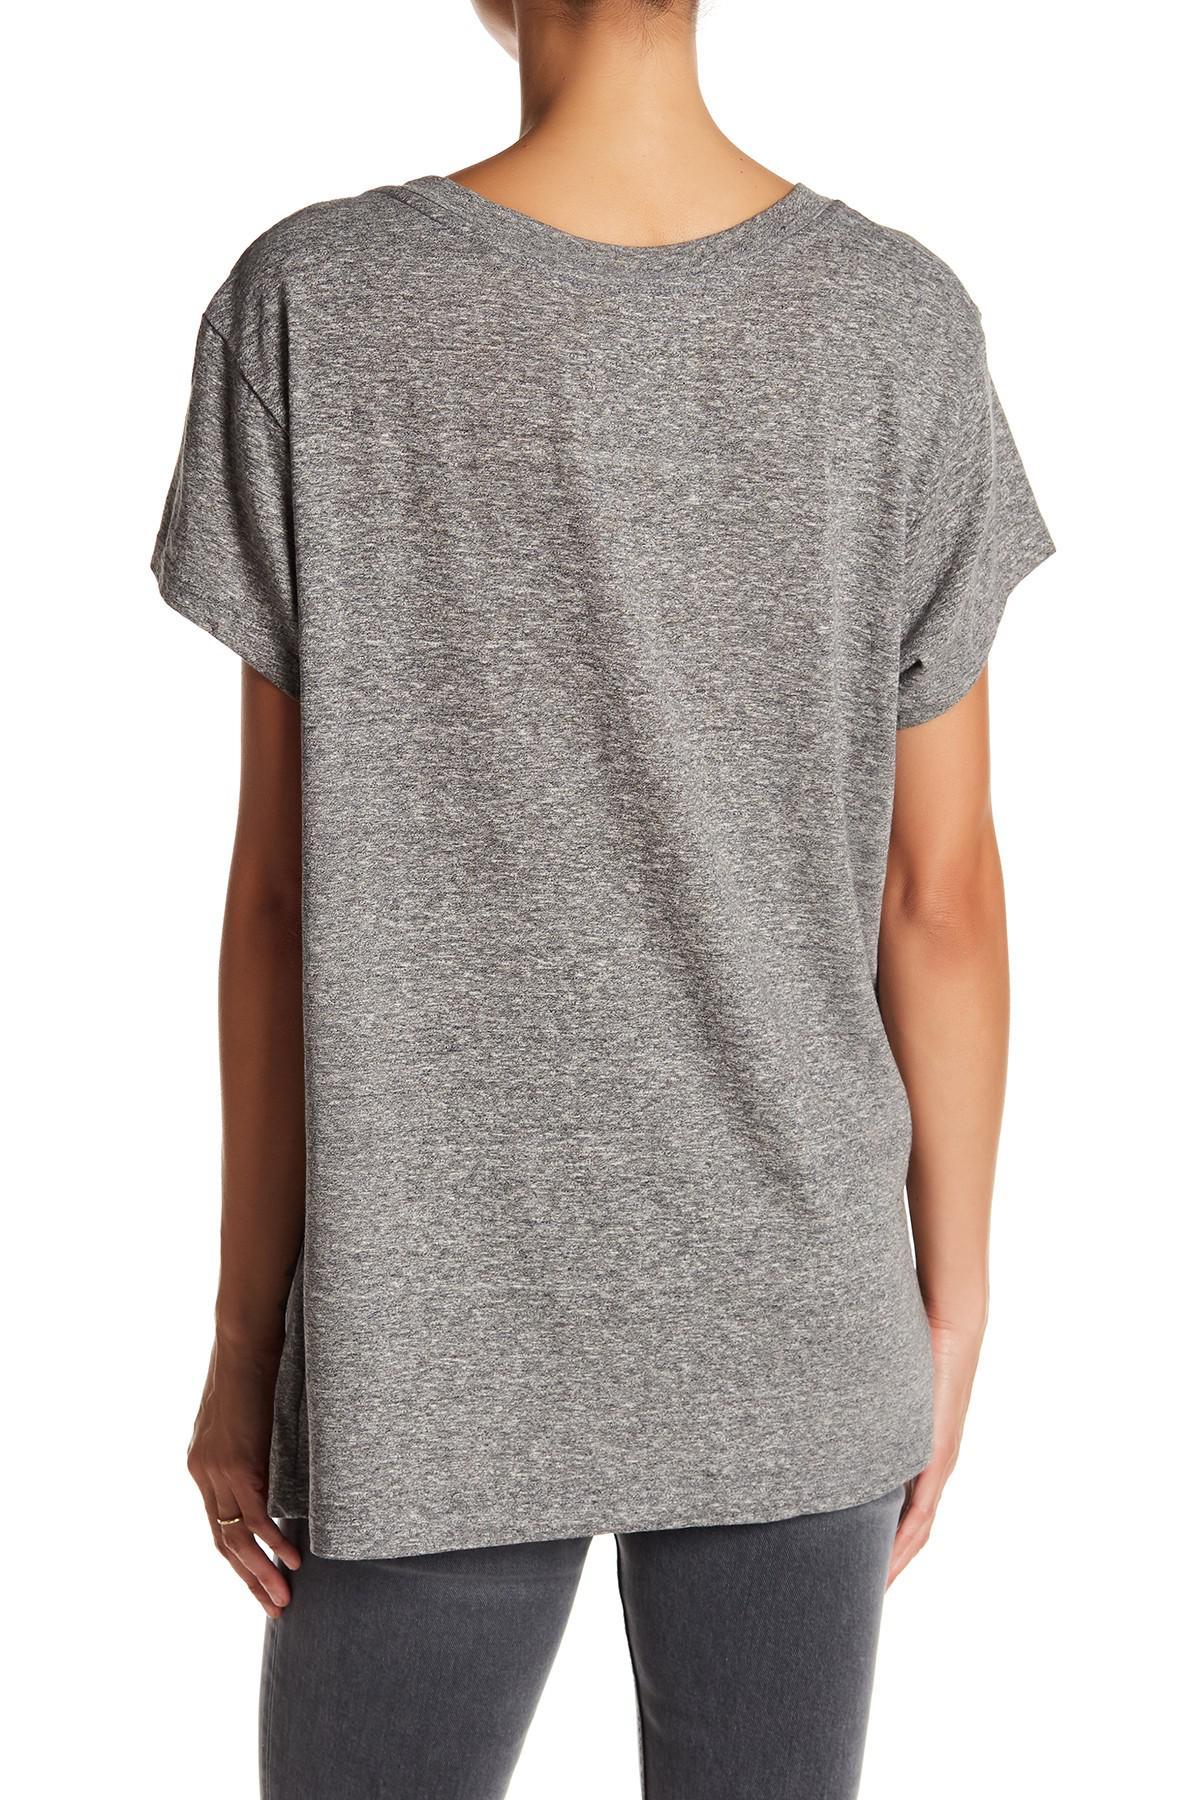 c52253dab3649 Nordstrom Supima Cotton Crew Neck T Shirt